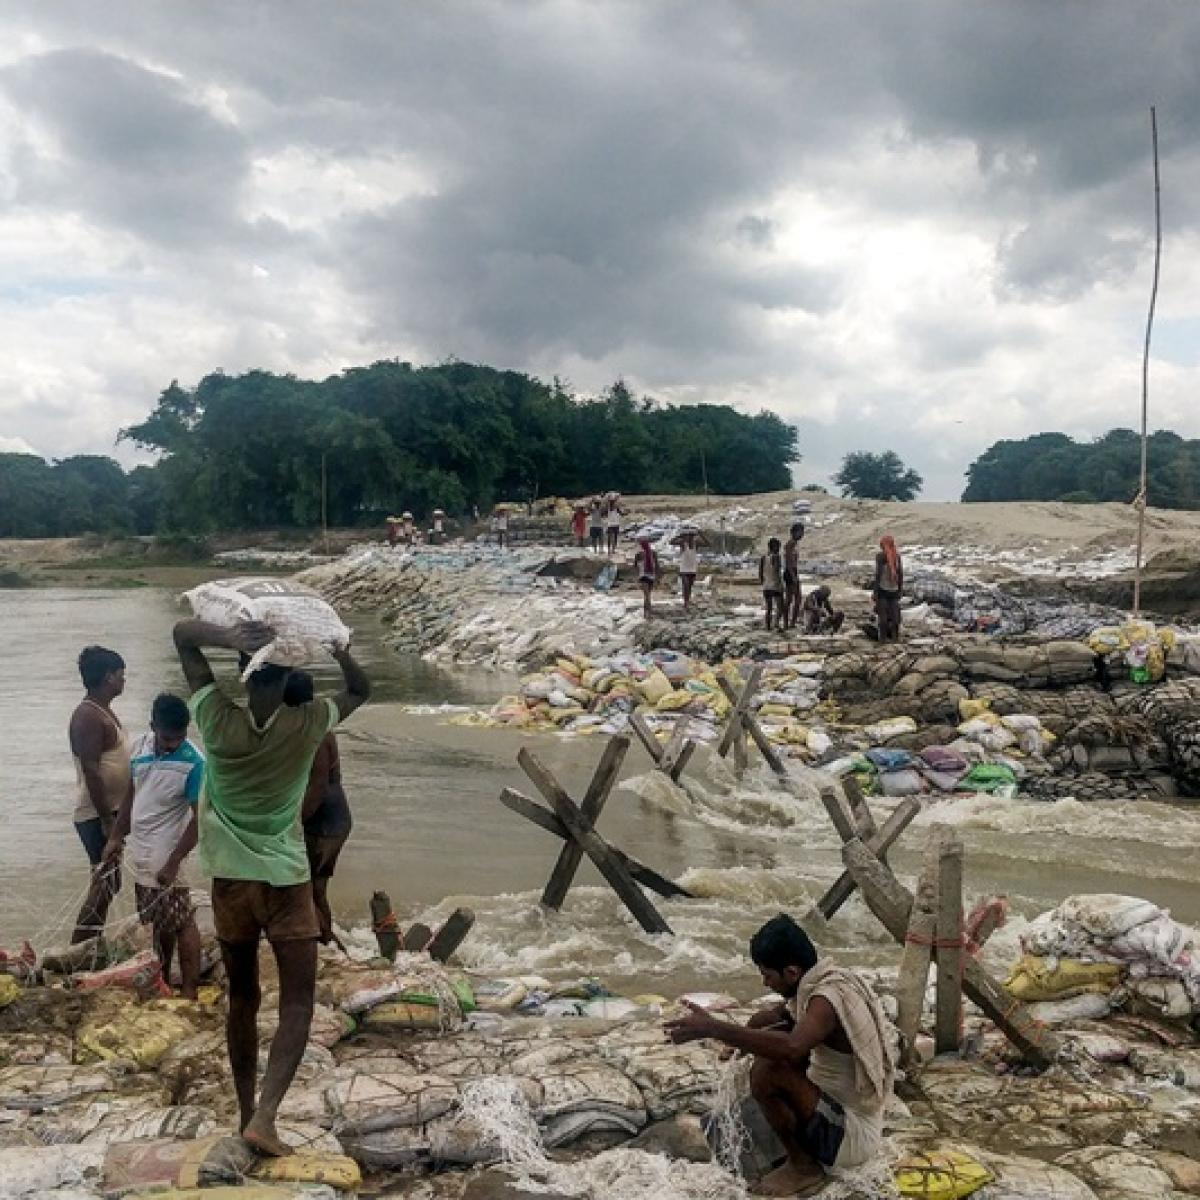 Bihar flood turns grim: 4 dead, 18 lakh hit; CM Nitish Kumar conducts aerial survey